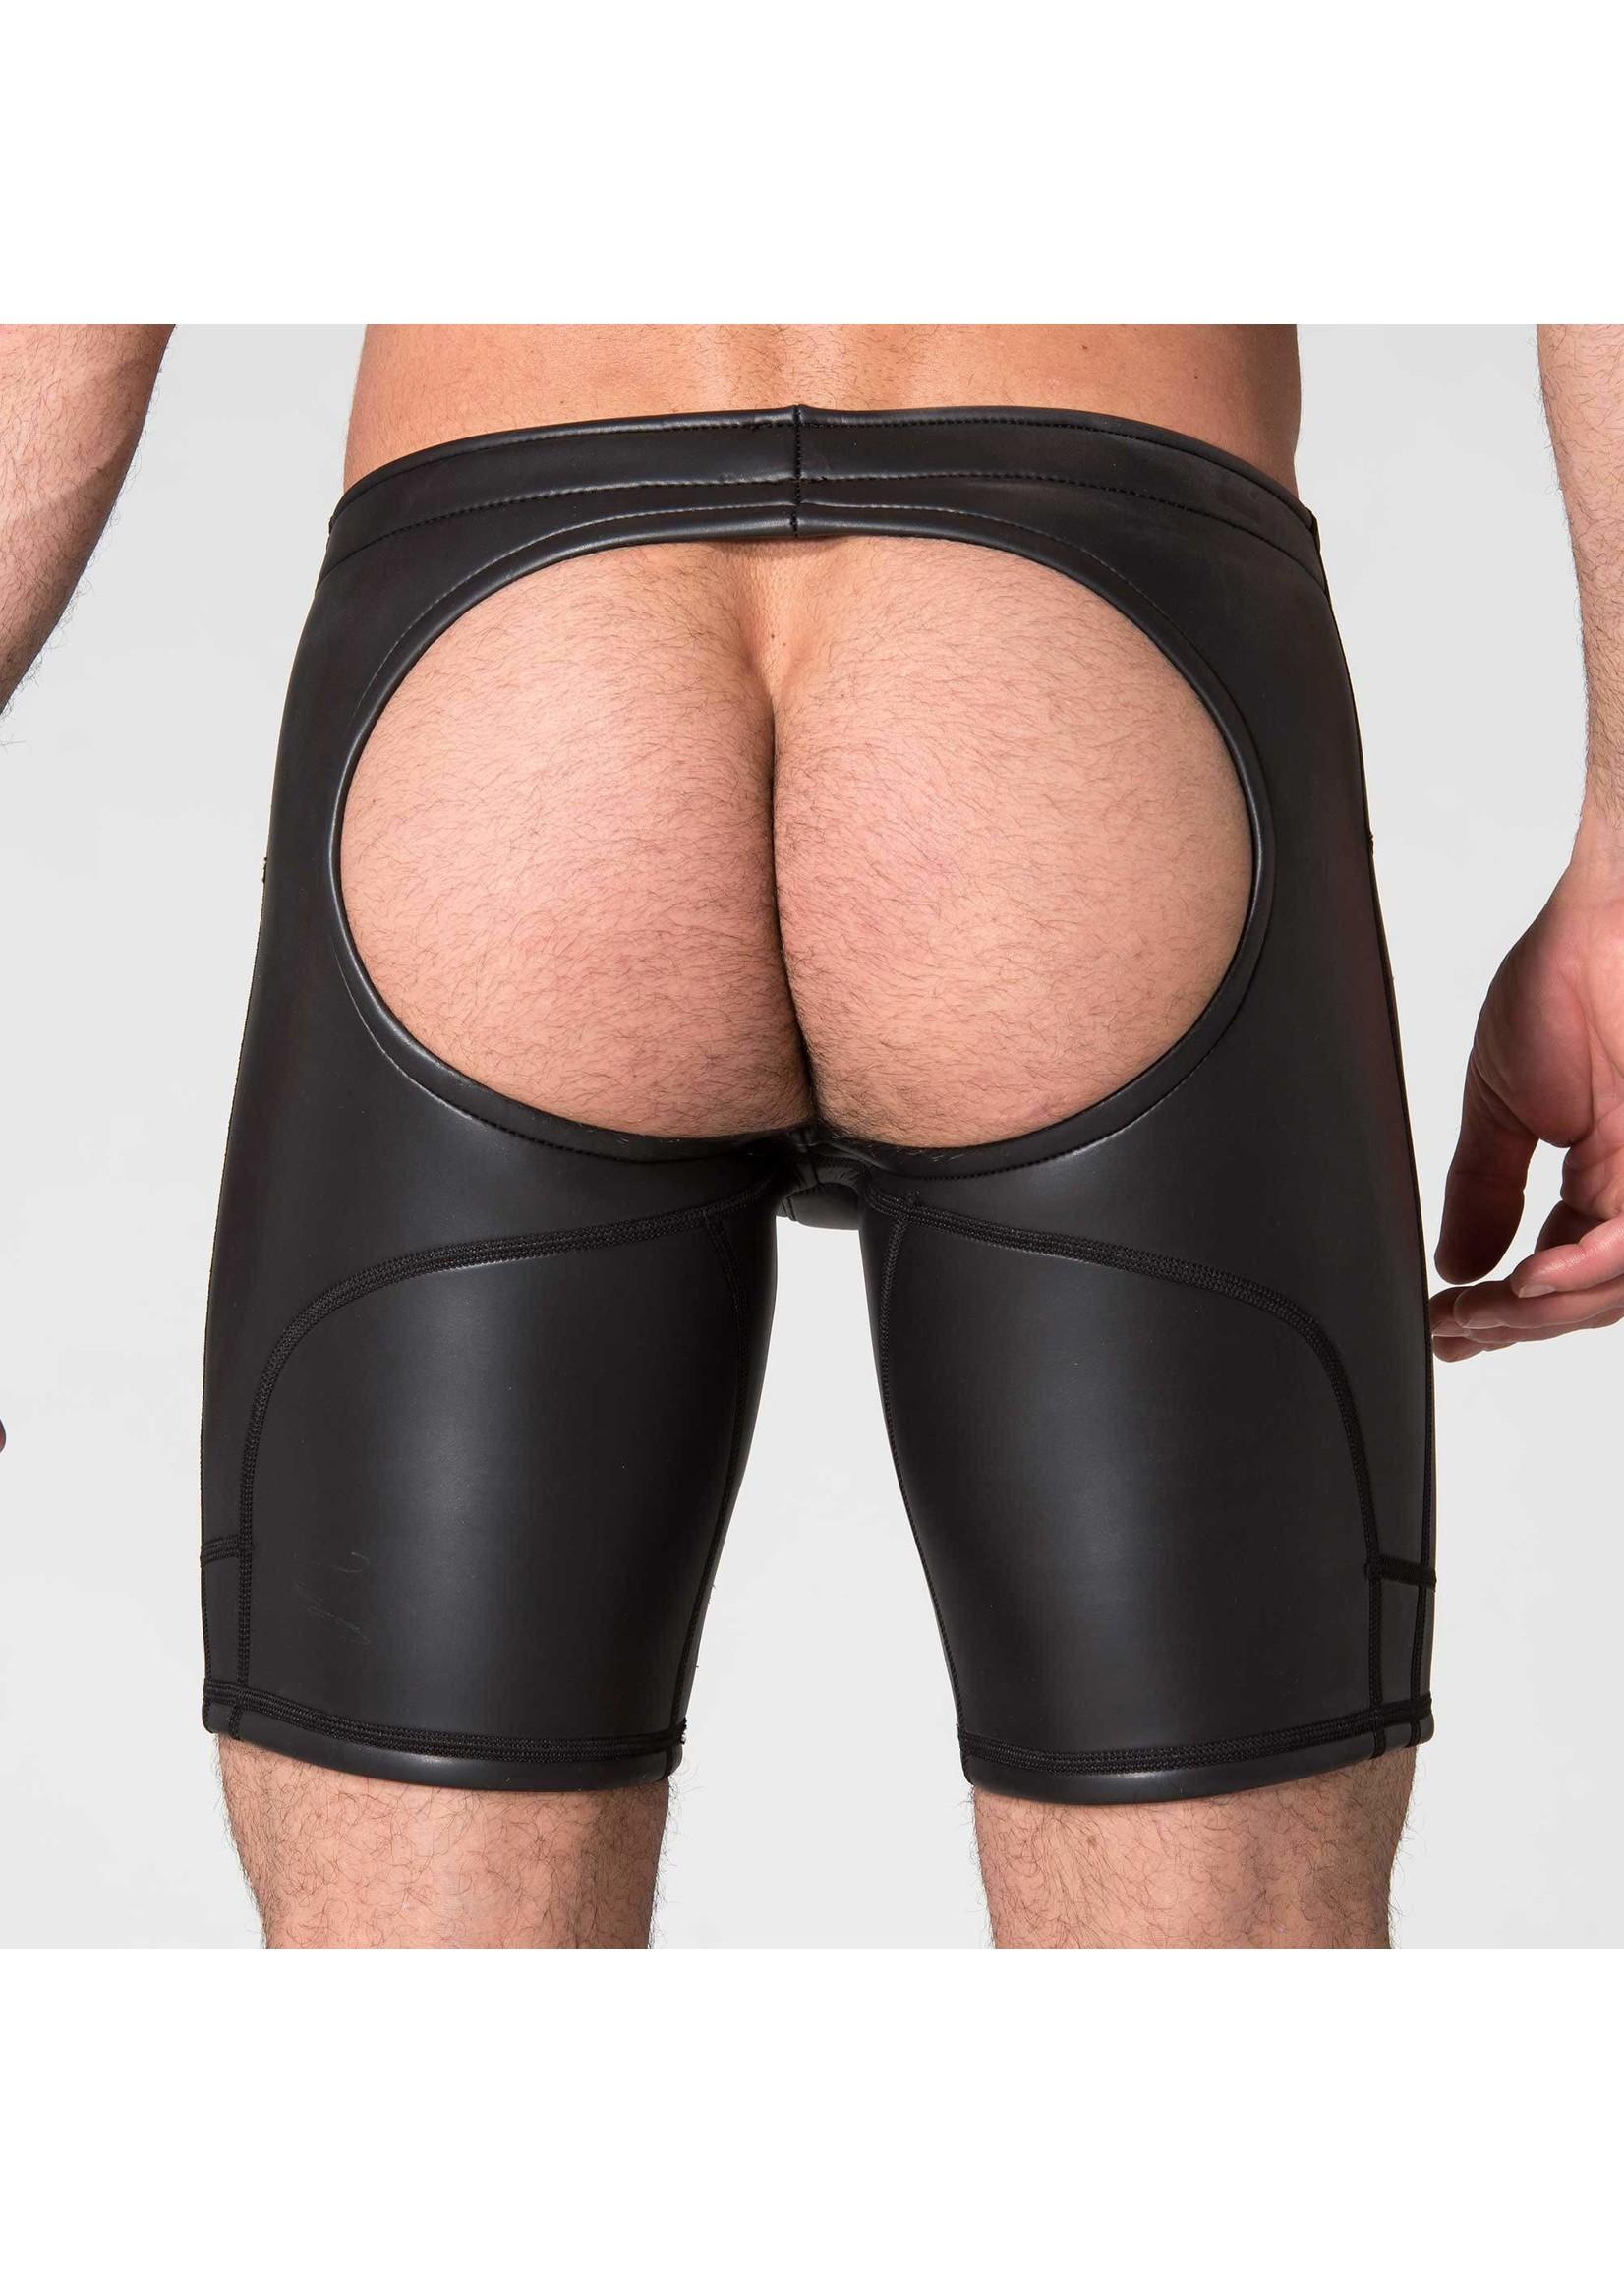 665 Leather 665 Open Ass Neoprene Shorts